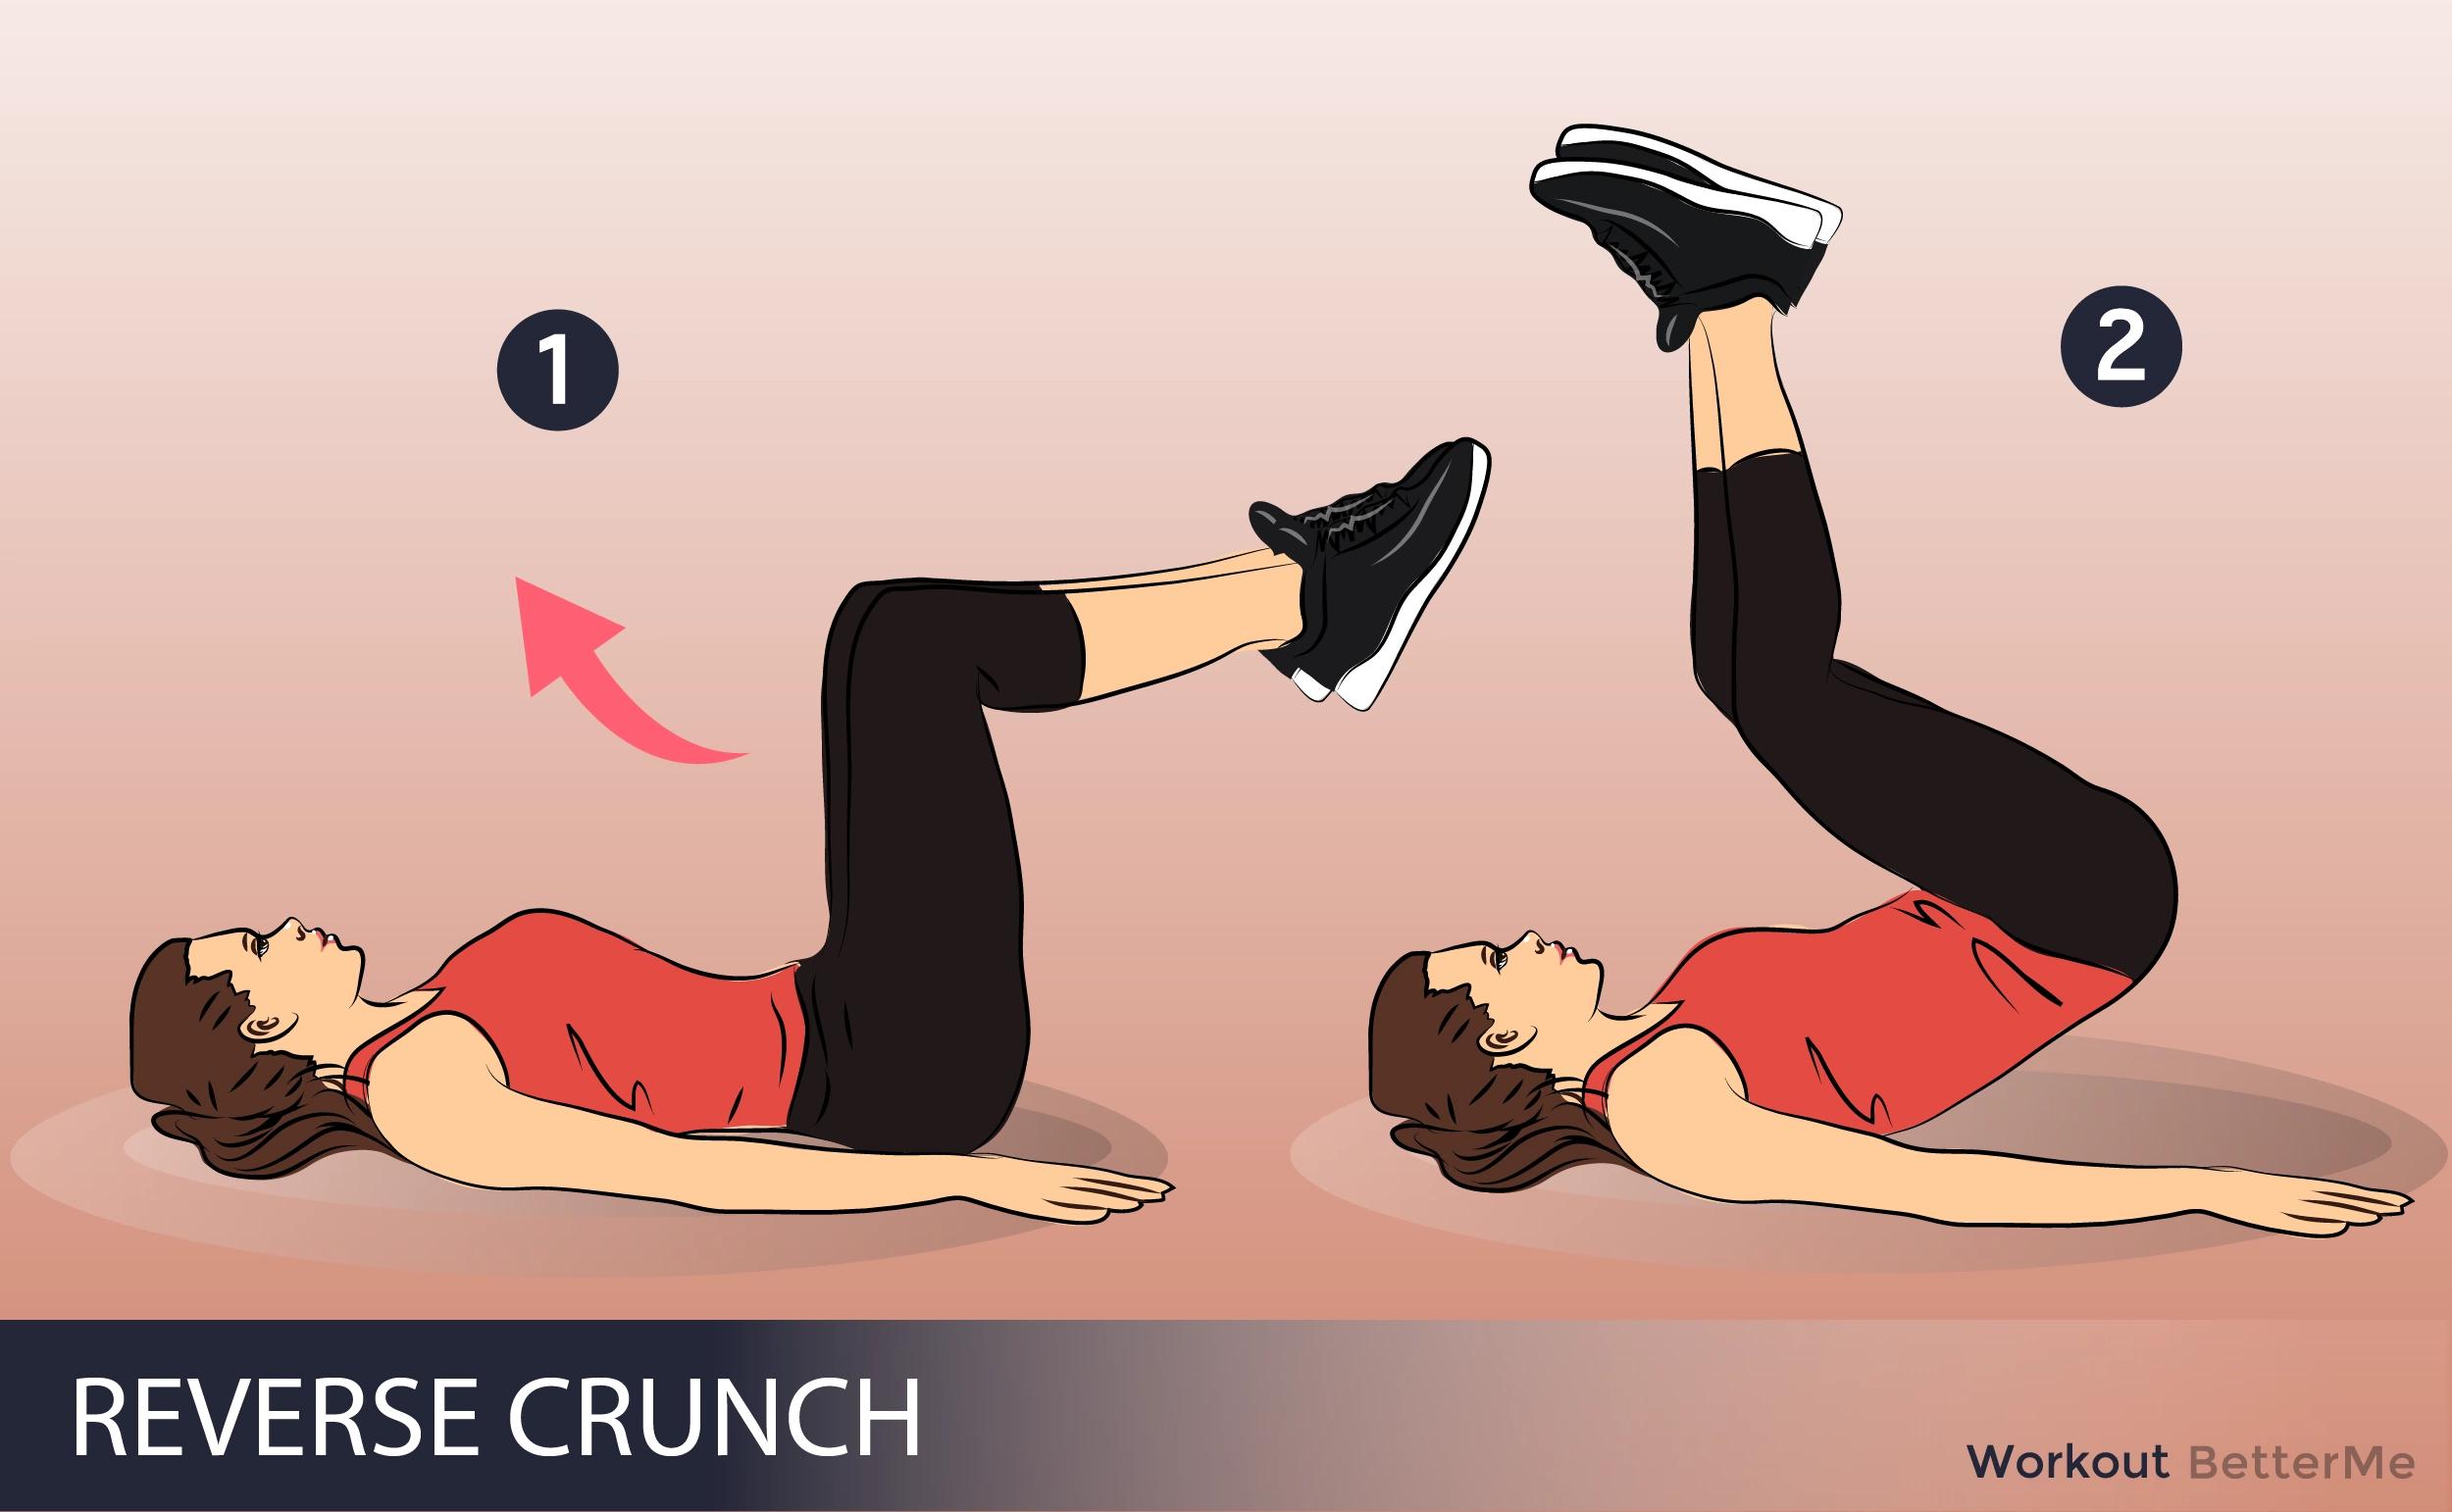 #9. Reverse crunch